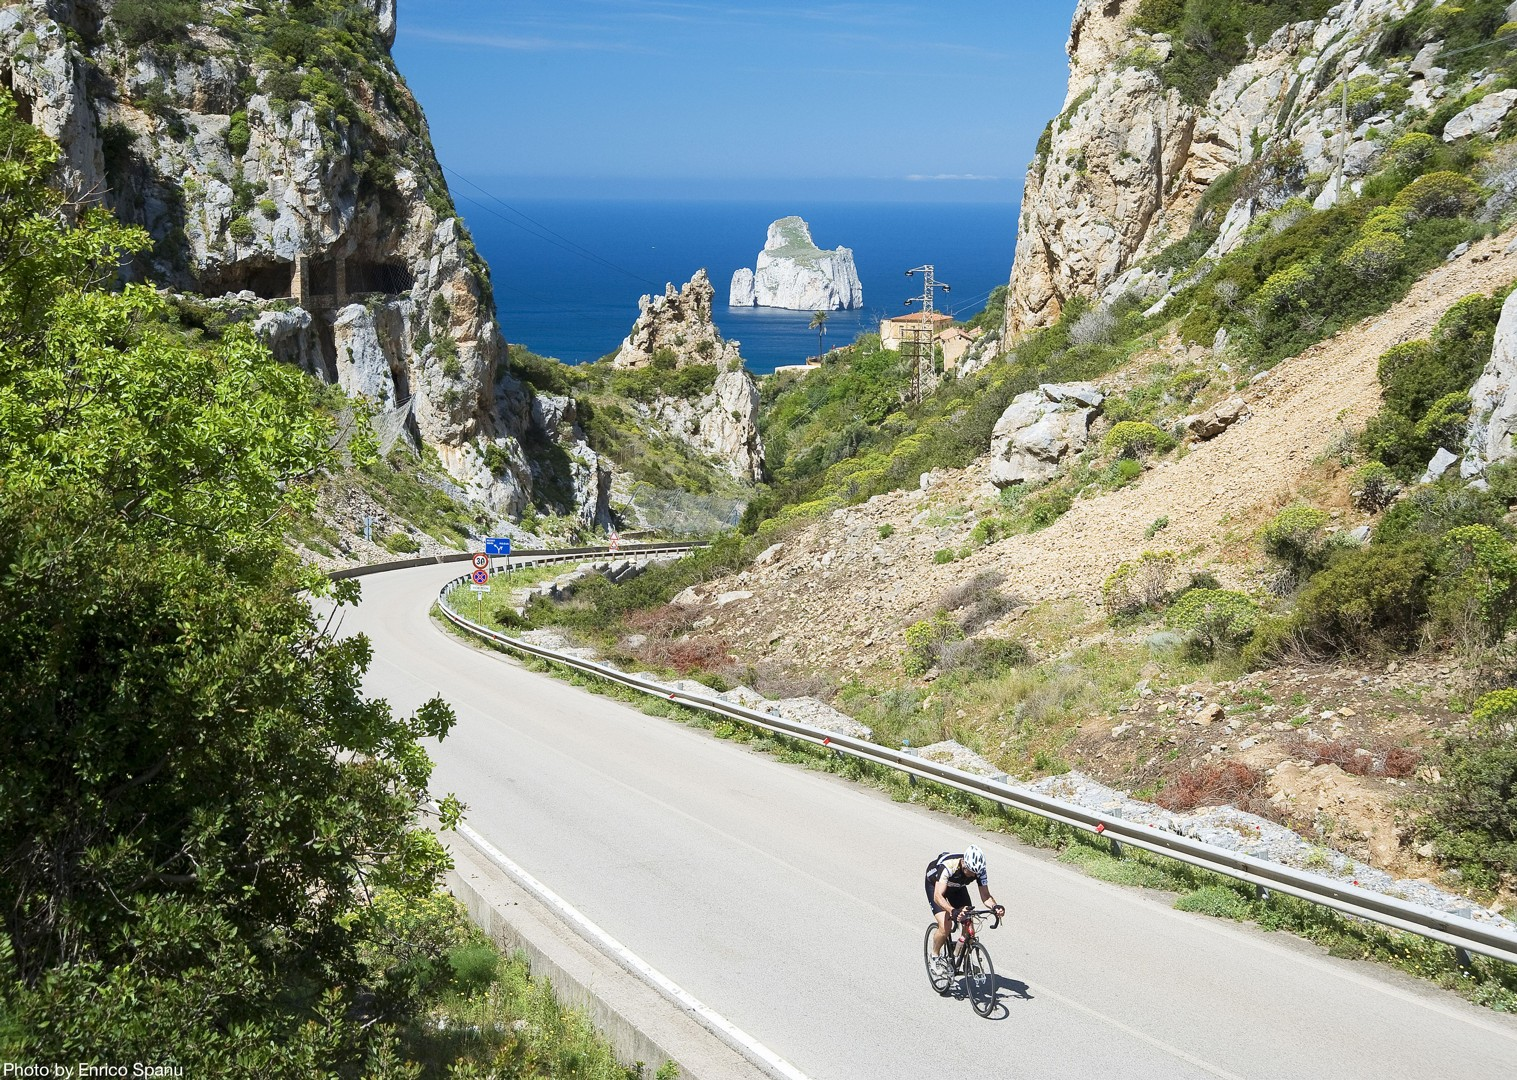 Road-Cycling-Holiday-Italy-Sardinia-Coastal-Explorer-Capo-Caccia.jpg - Italy - Sardinia - Coastal Explorer - Road Cycling